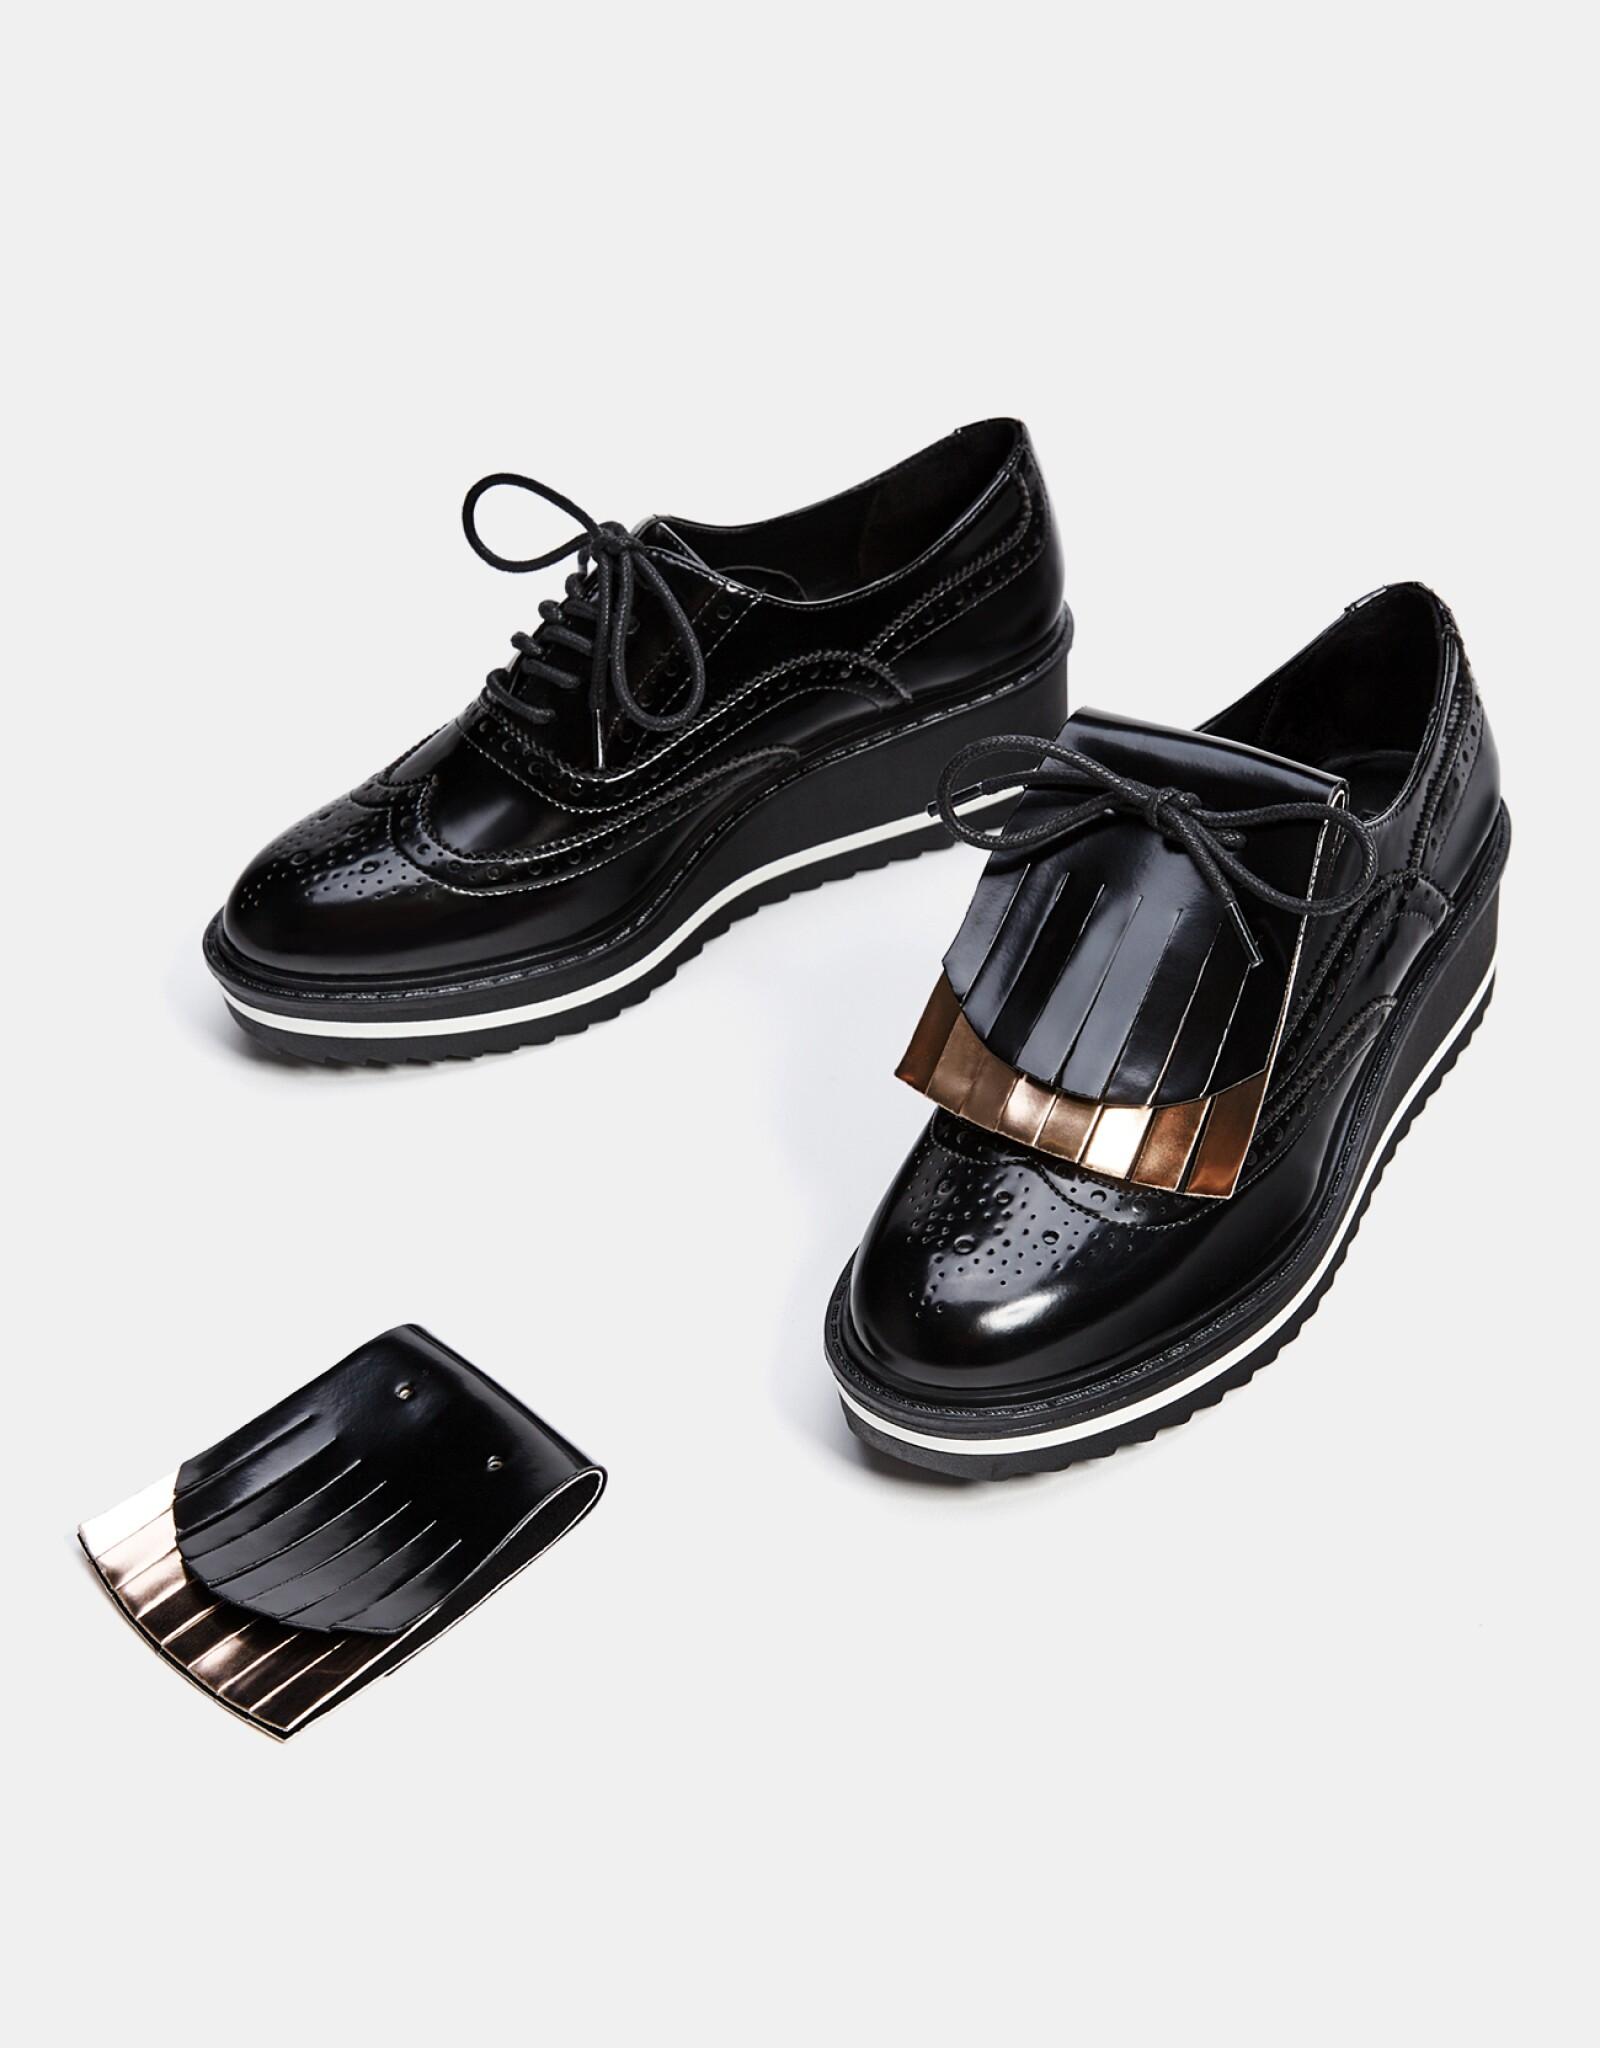 Zapatos accesibles